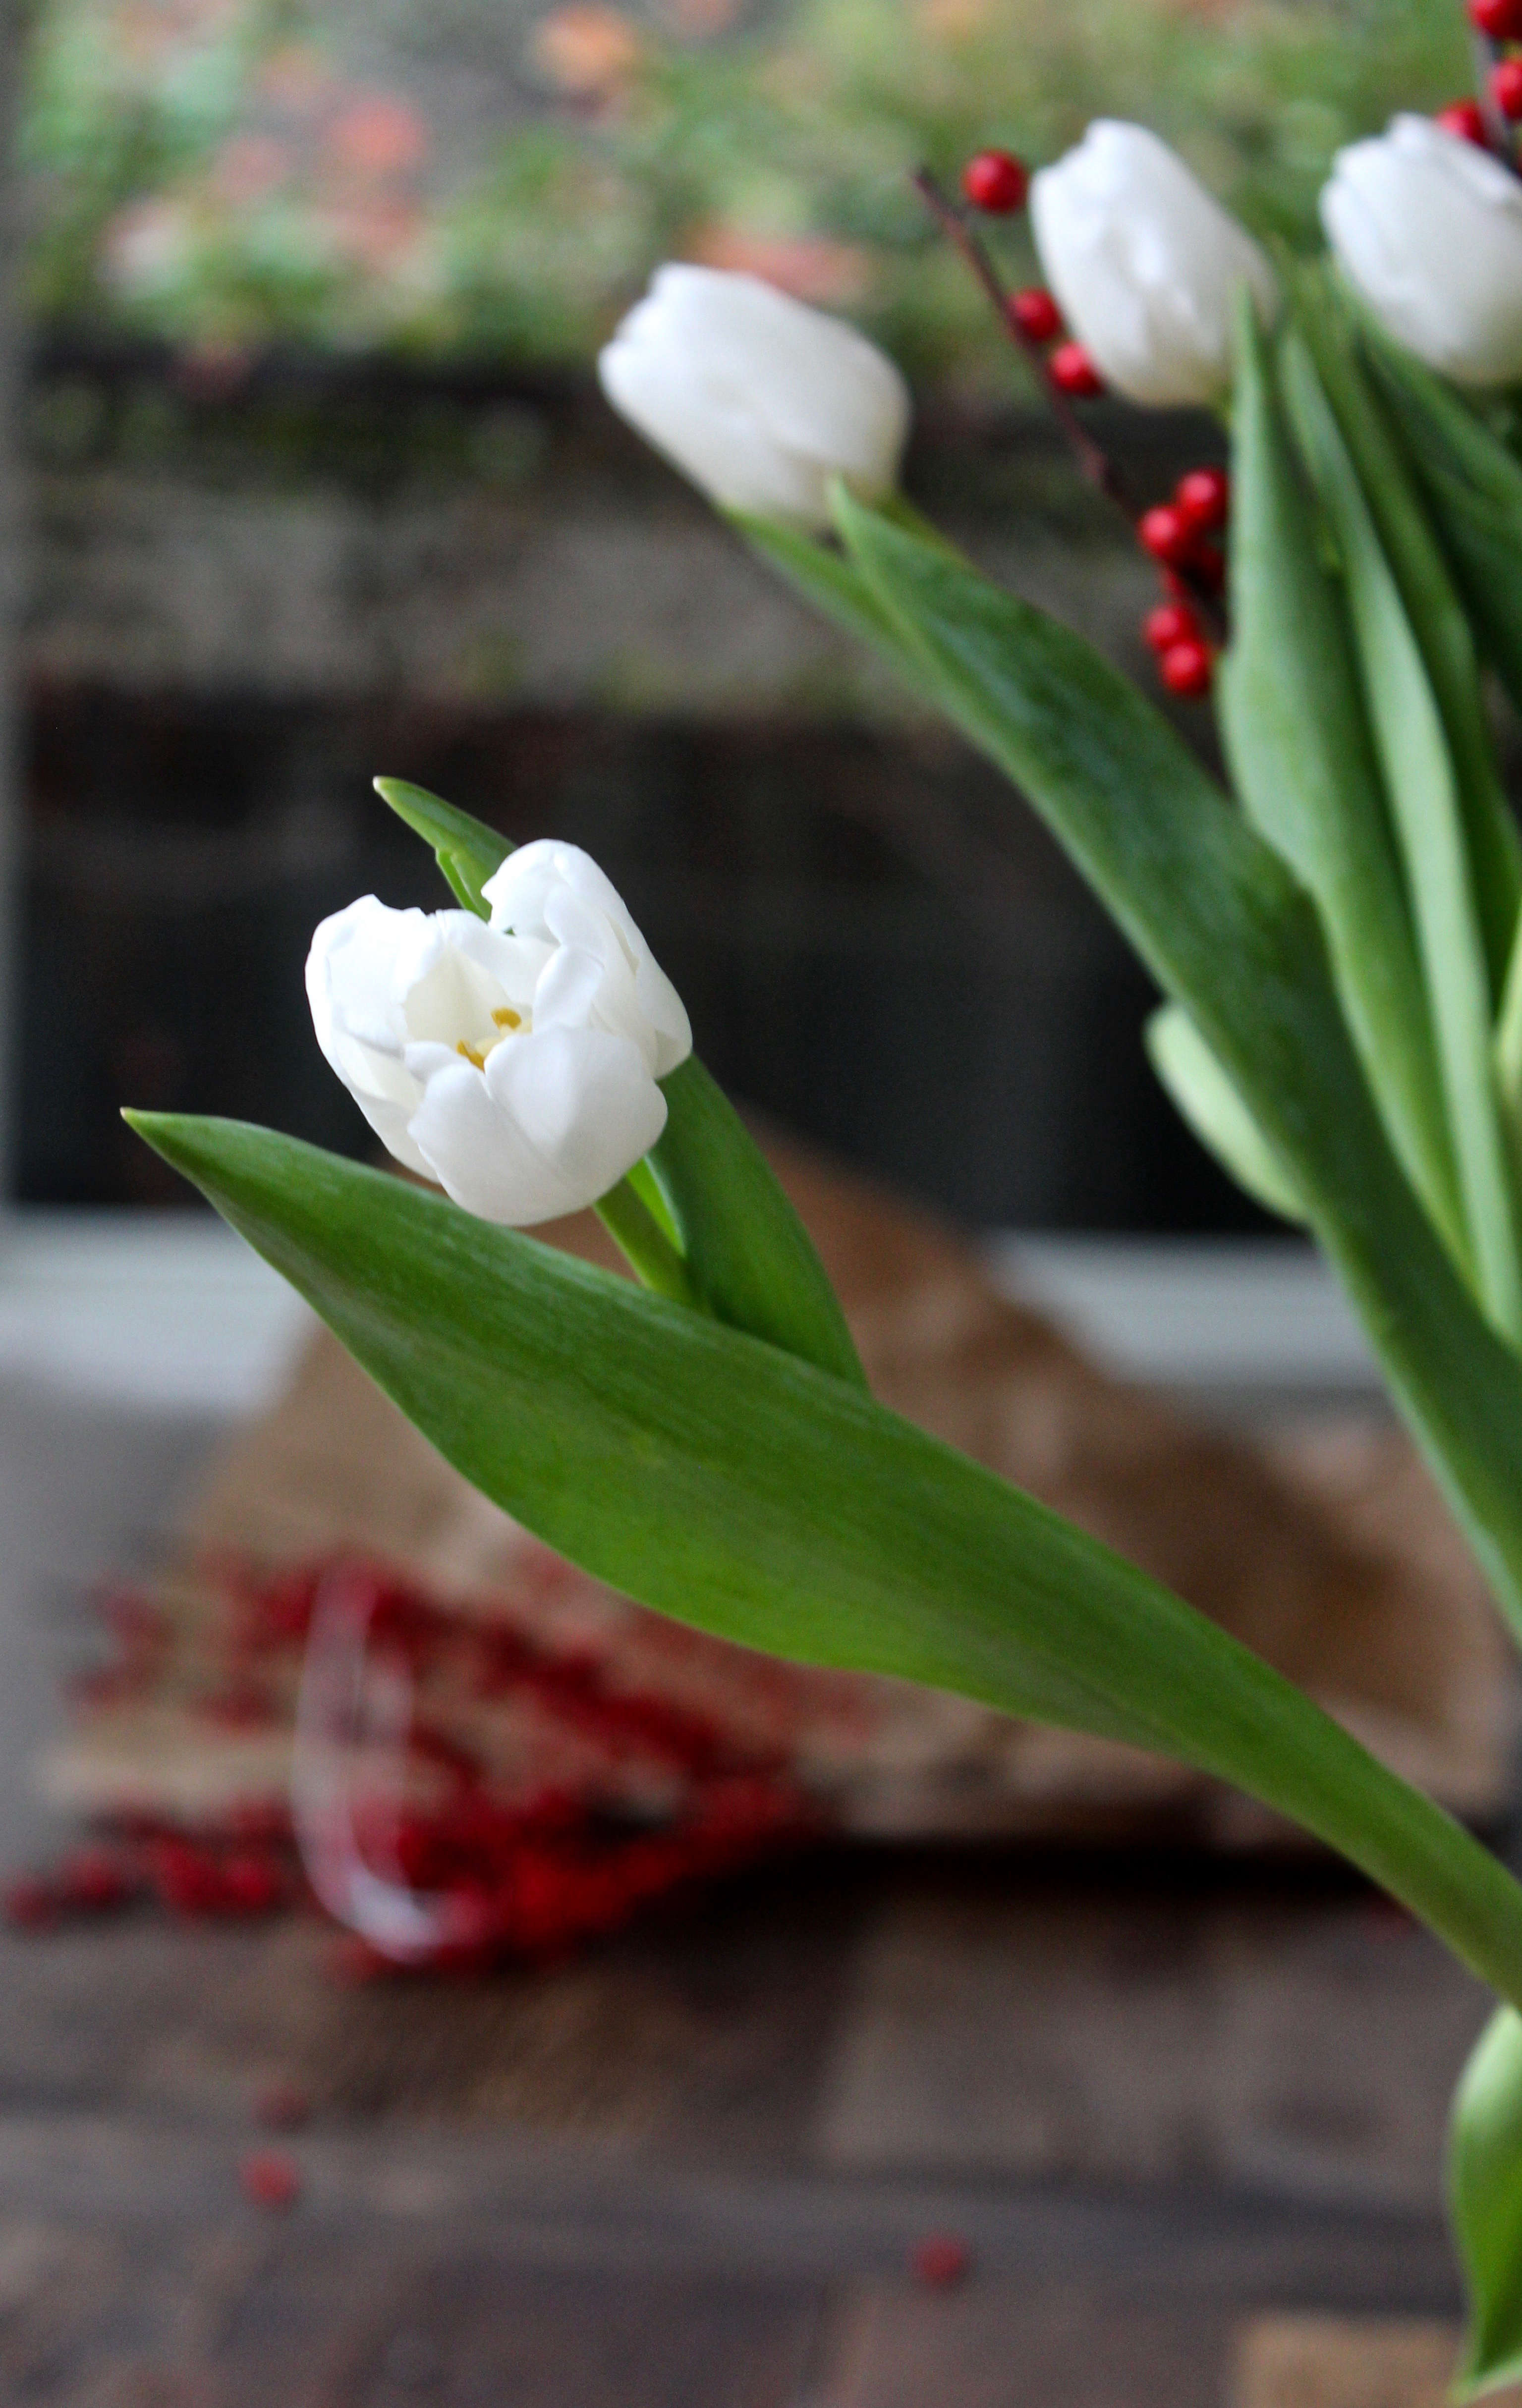 tulips-on-the-bulb-michelle-slatalla-img-3767